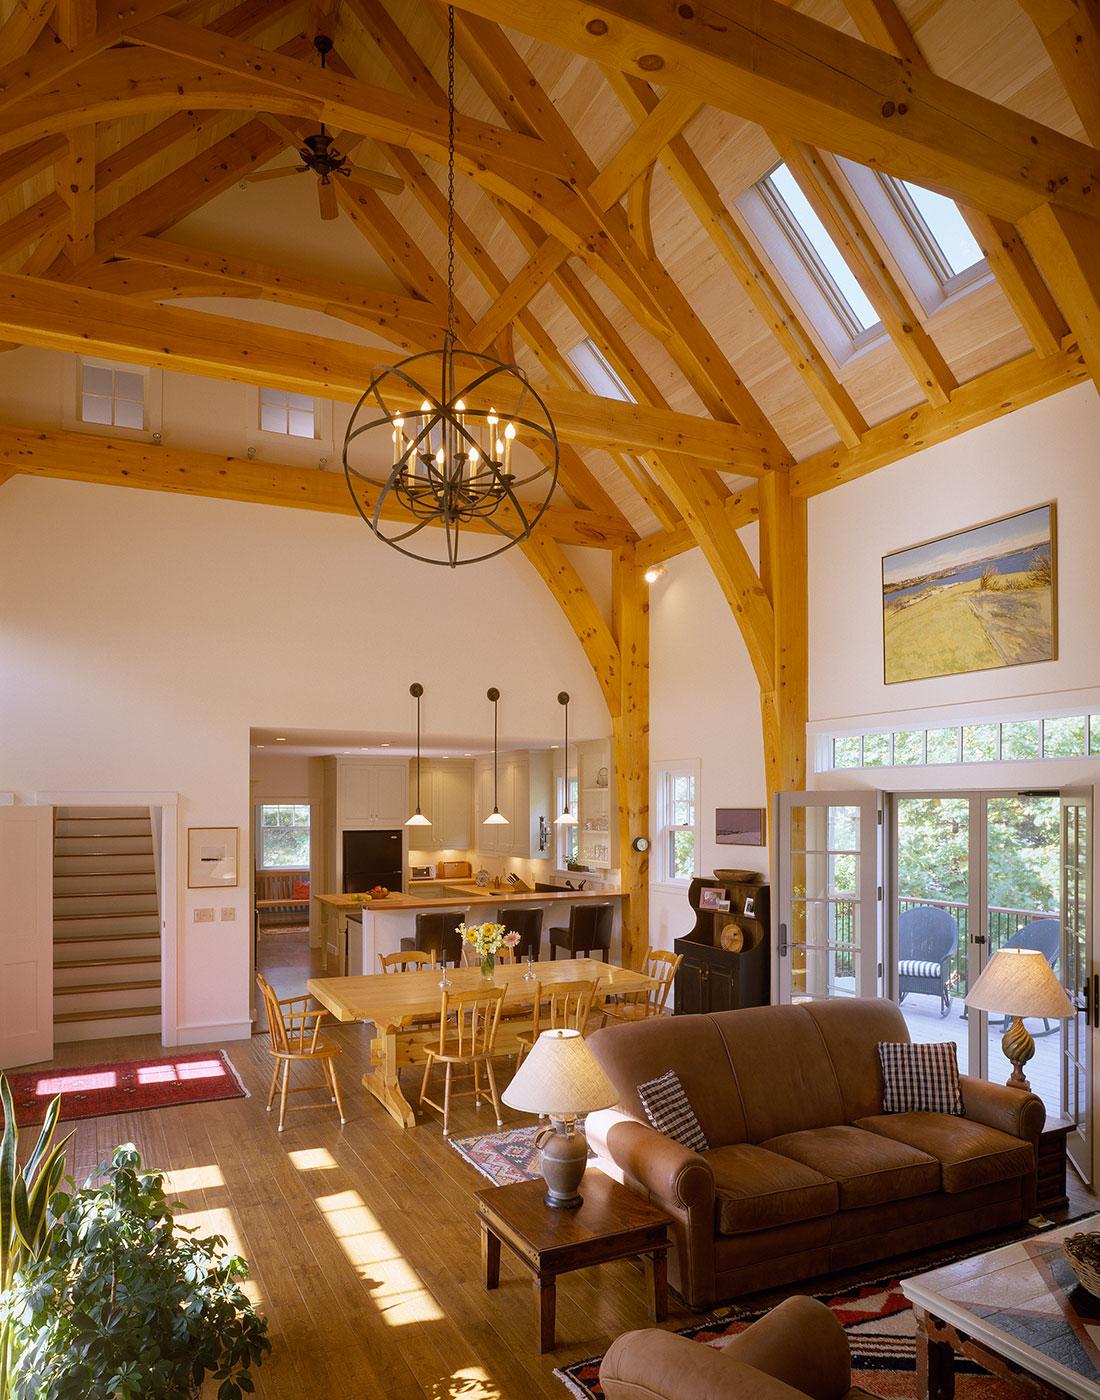 Houses and Barns  Timber Frame family home